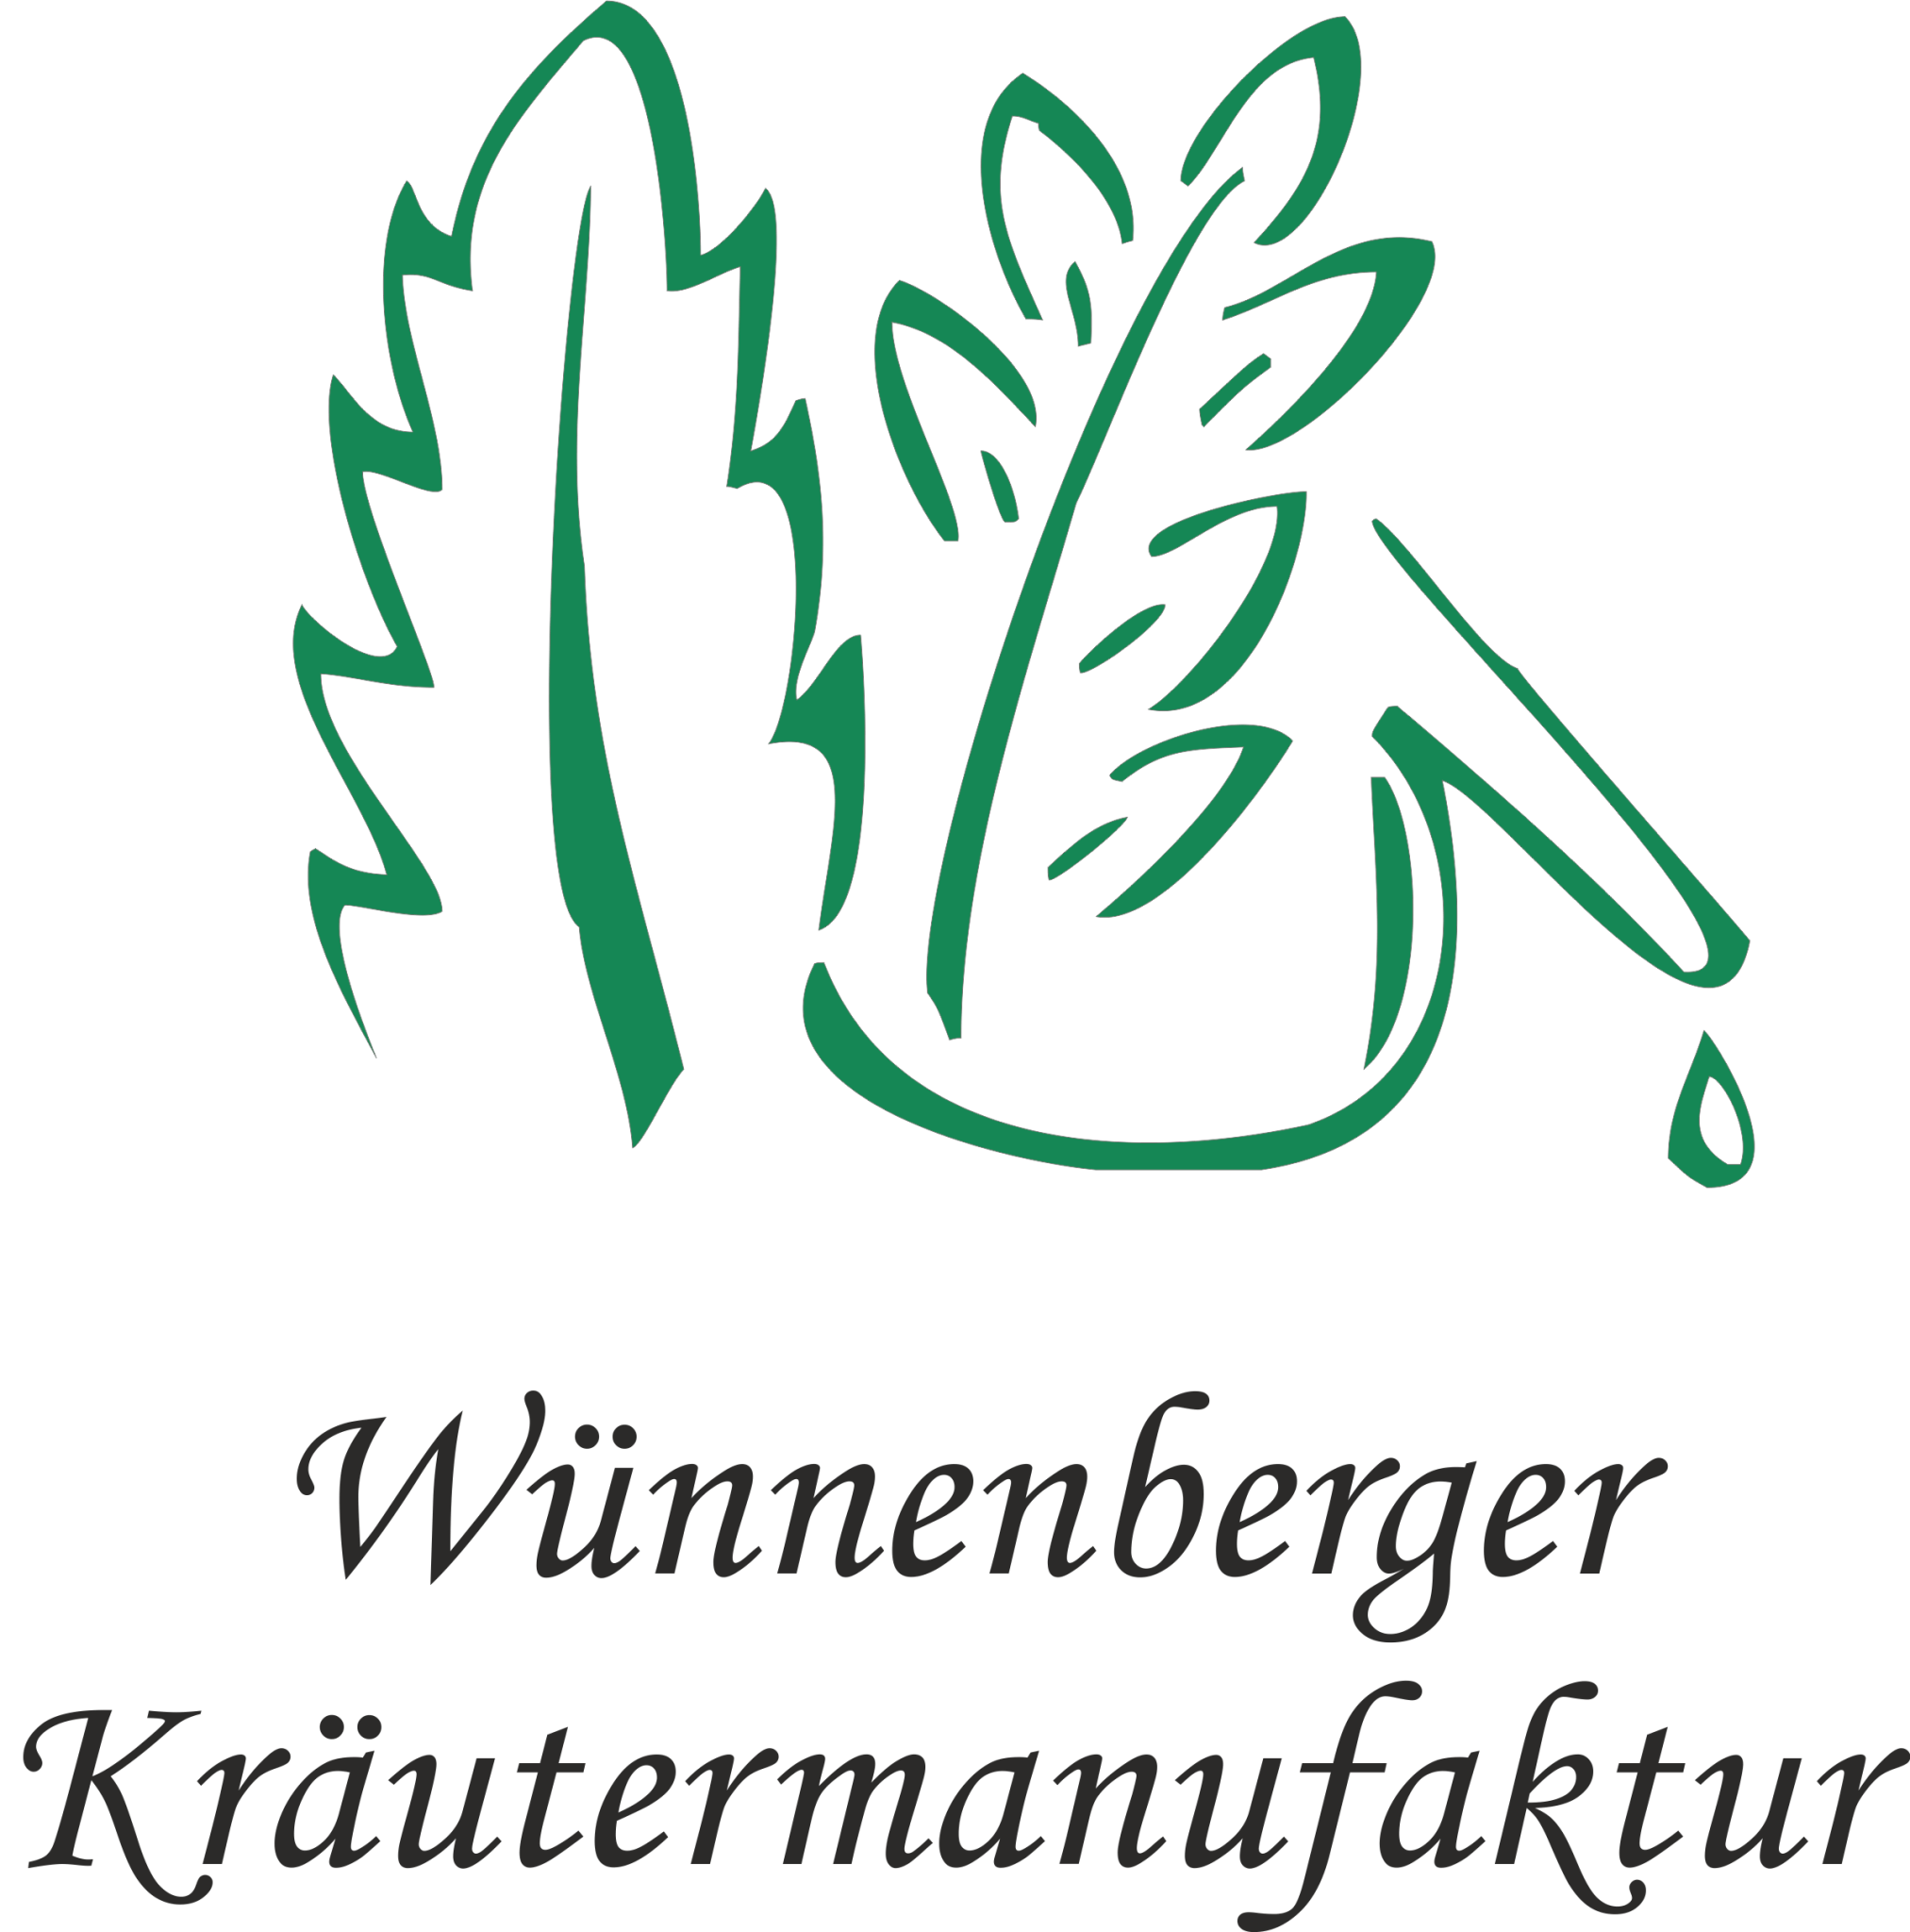 Wünnenberger Kräutermanufaktur